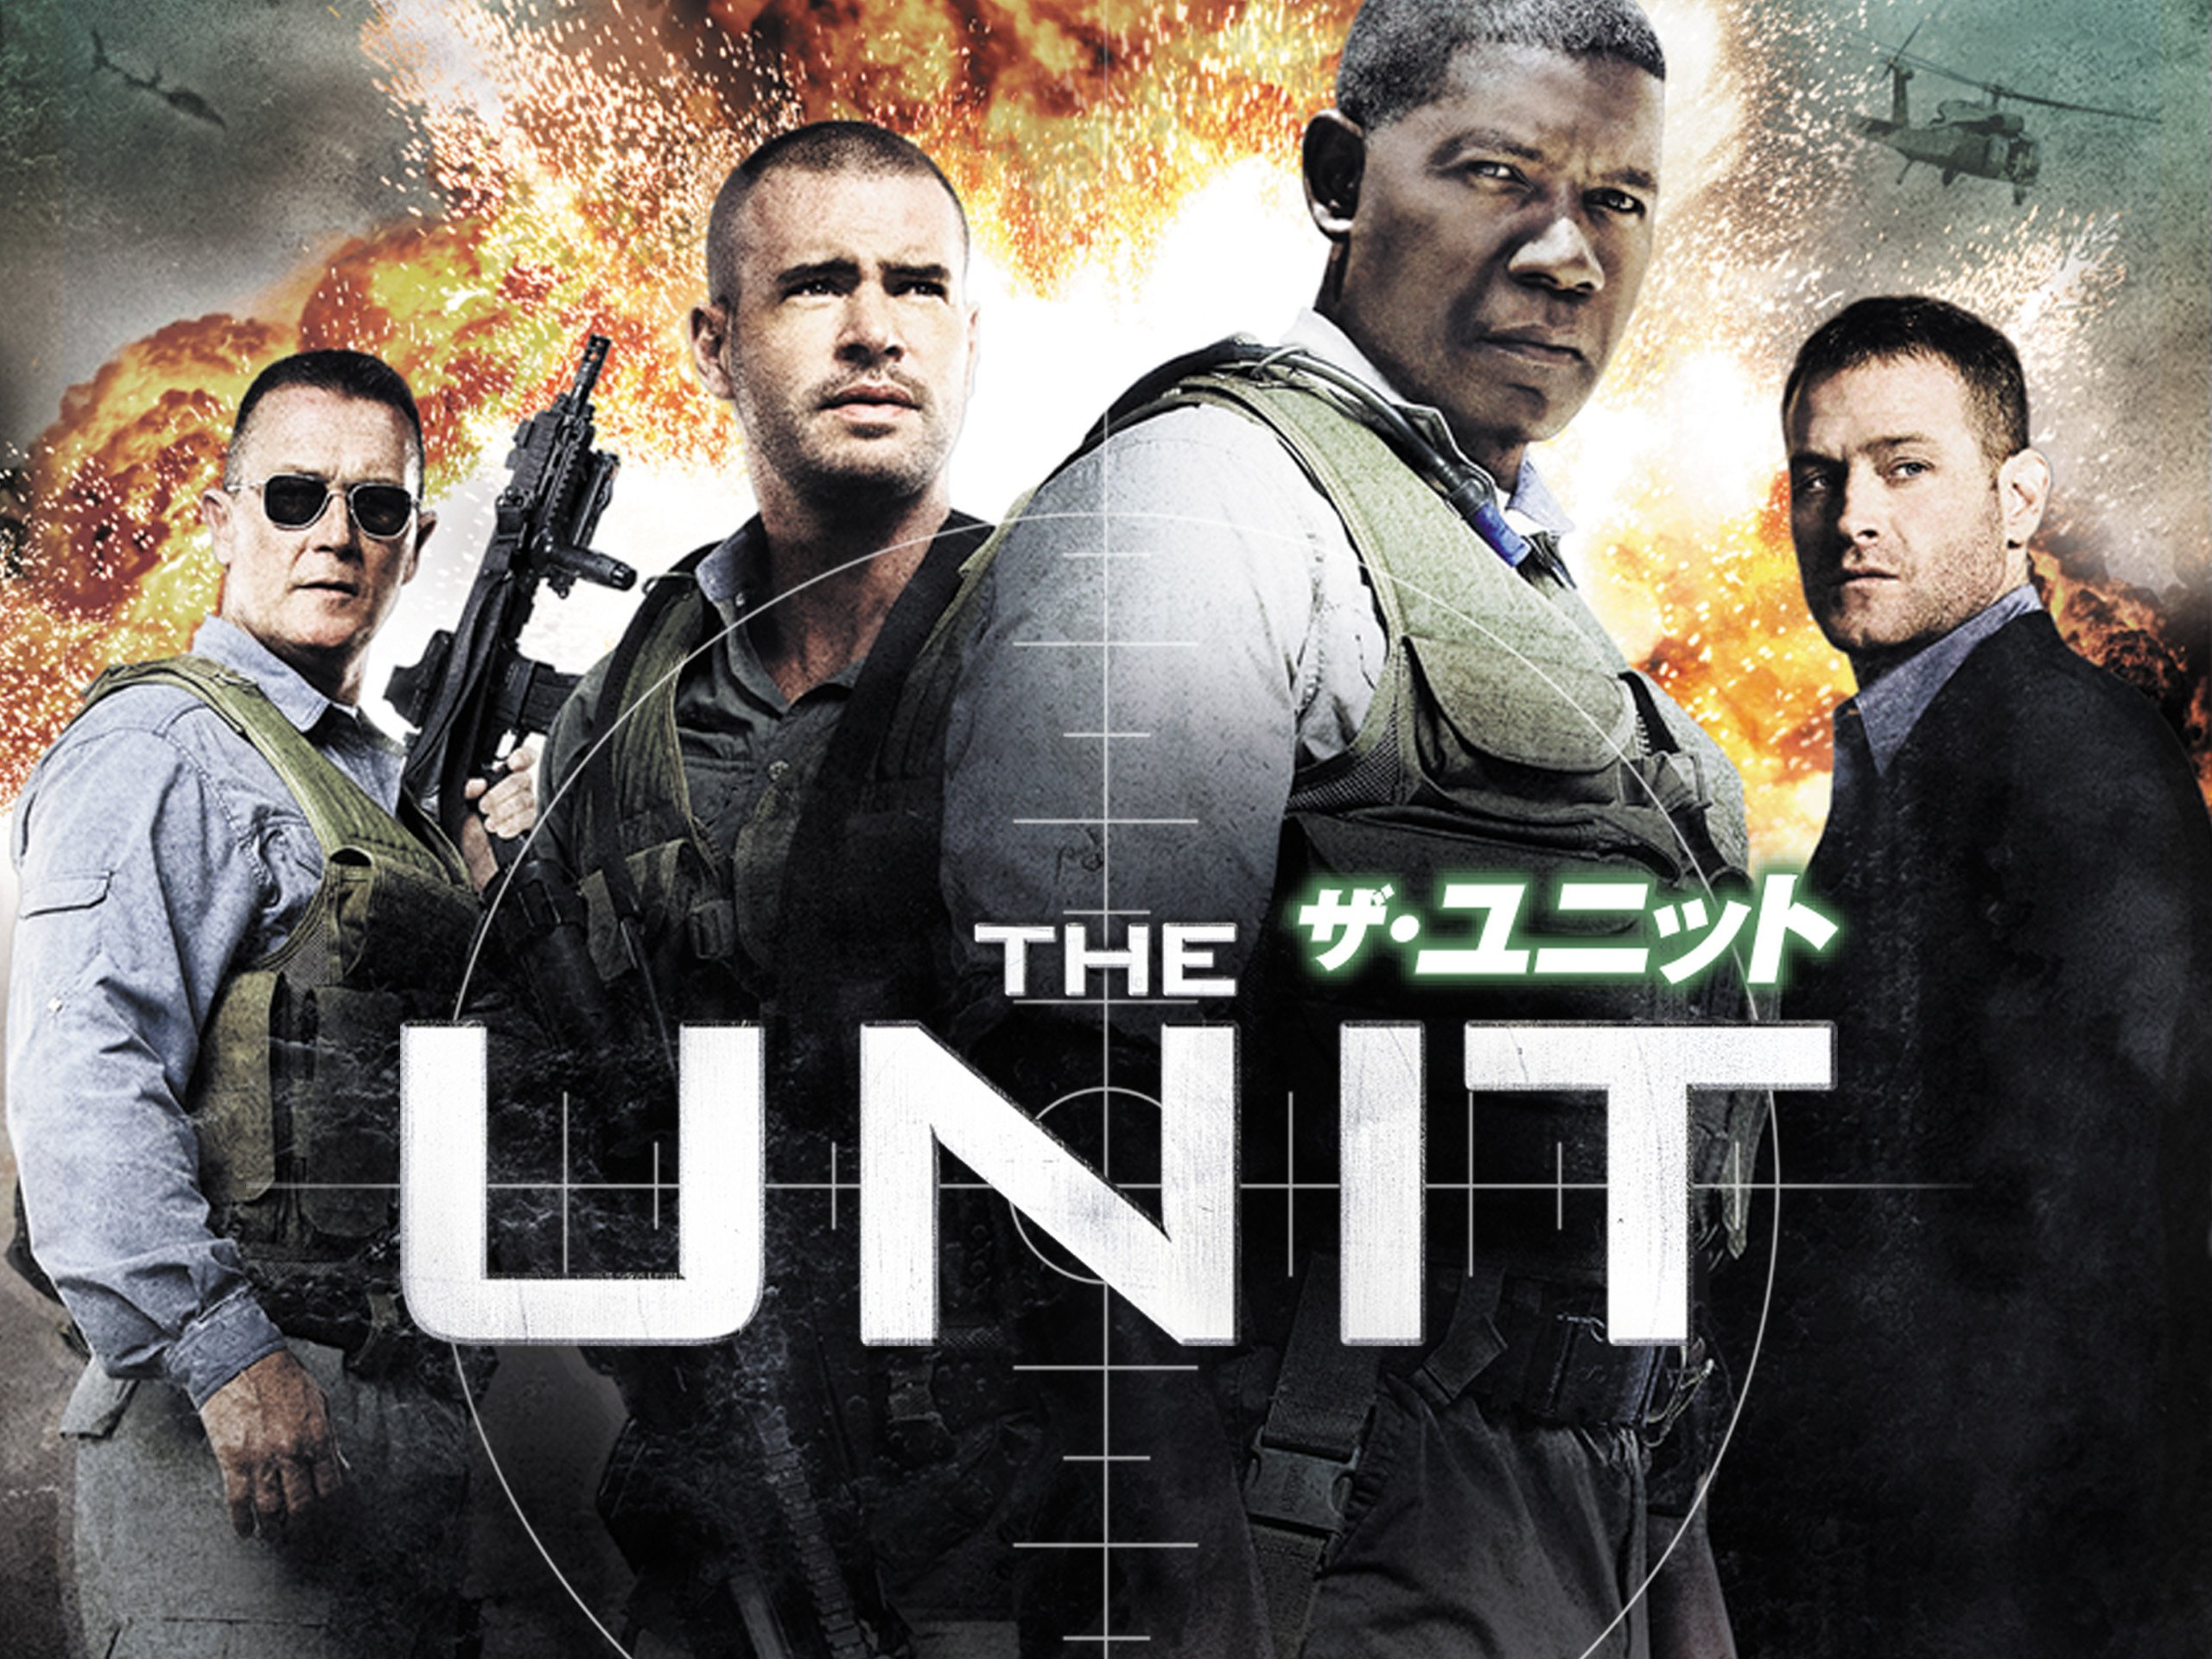 amazon co jp ザ ユニット 米軍極秘部隊 シーズン1 字幕版 を観る